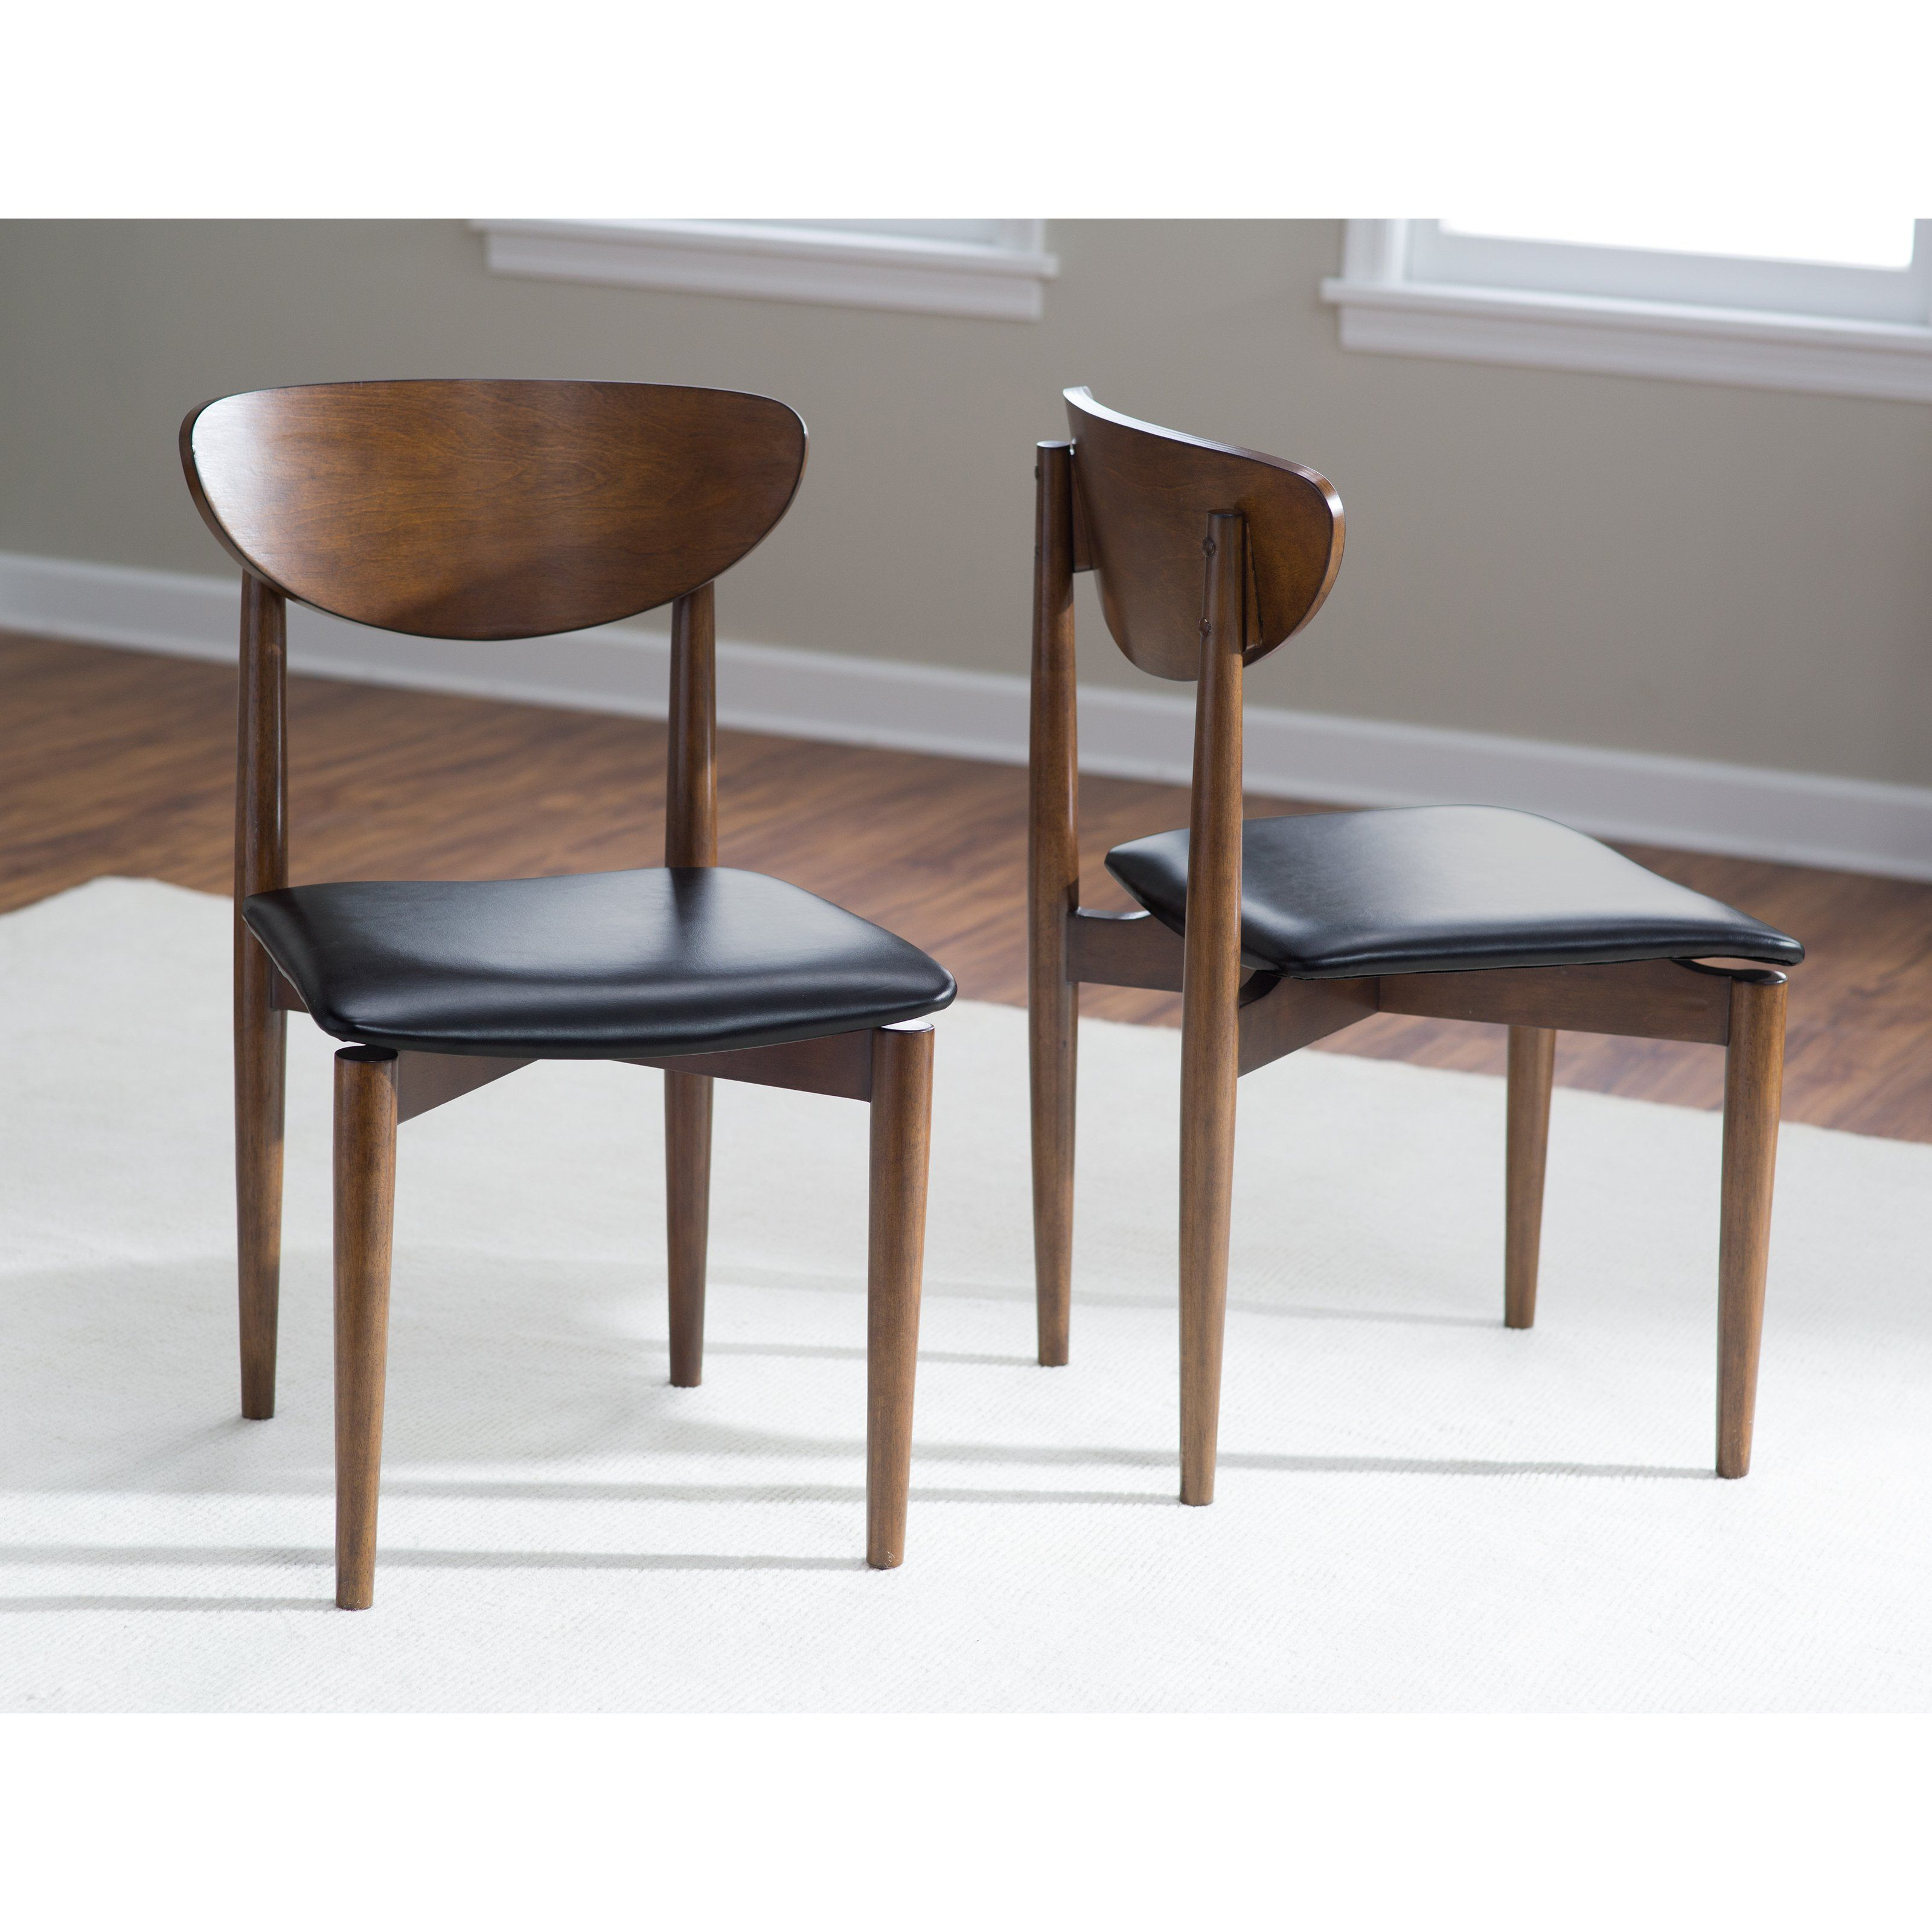 Incredible Belham Living Carter Mid Century Modern Dining Chair Set Dailytribune Chair Design For Home Dailytribuneorg